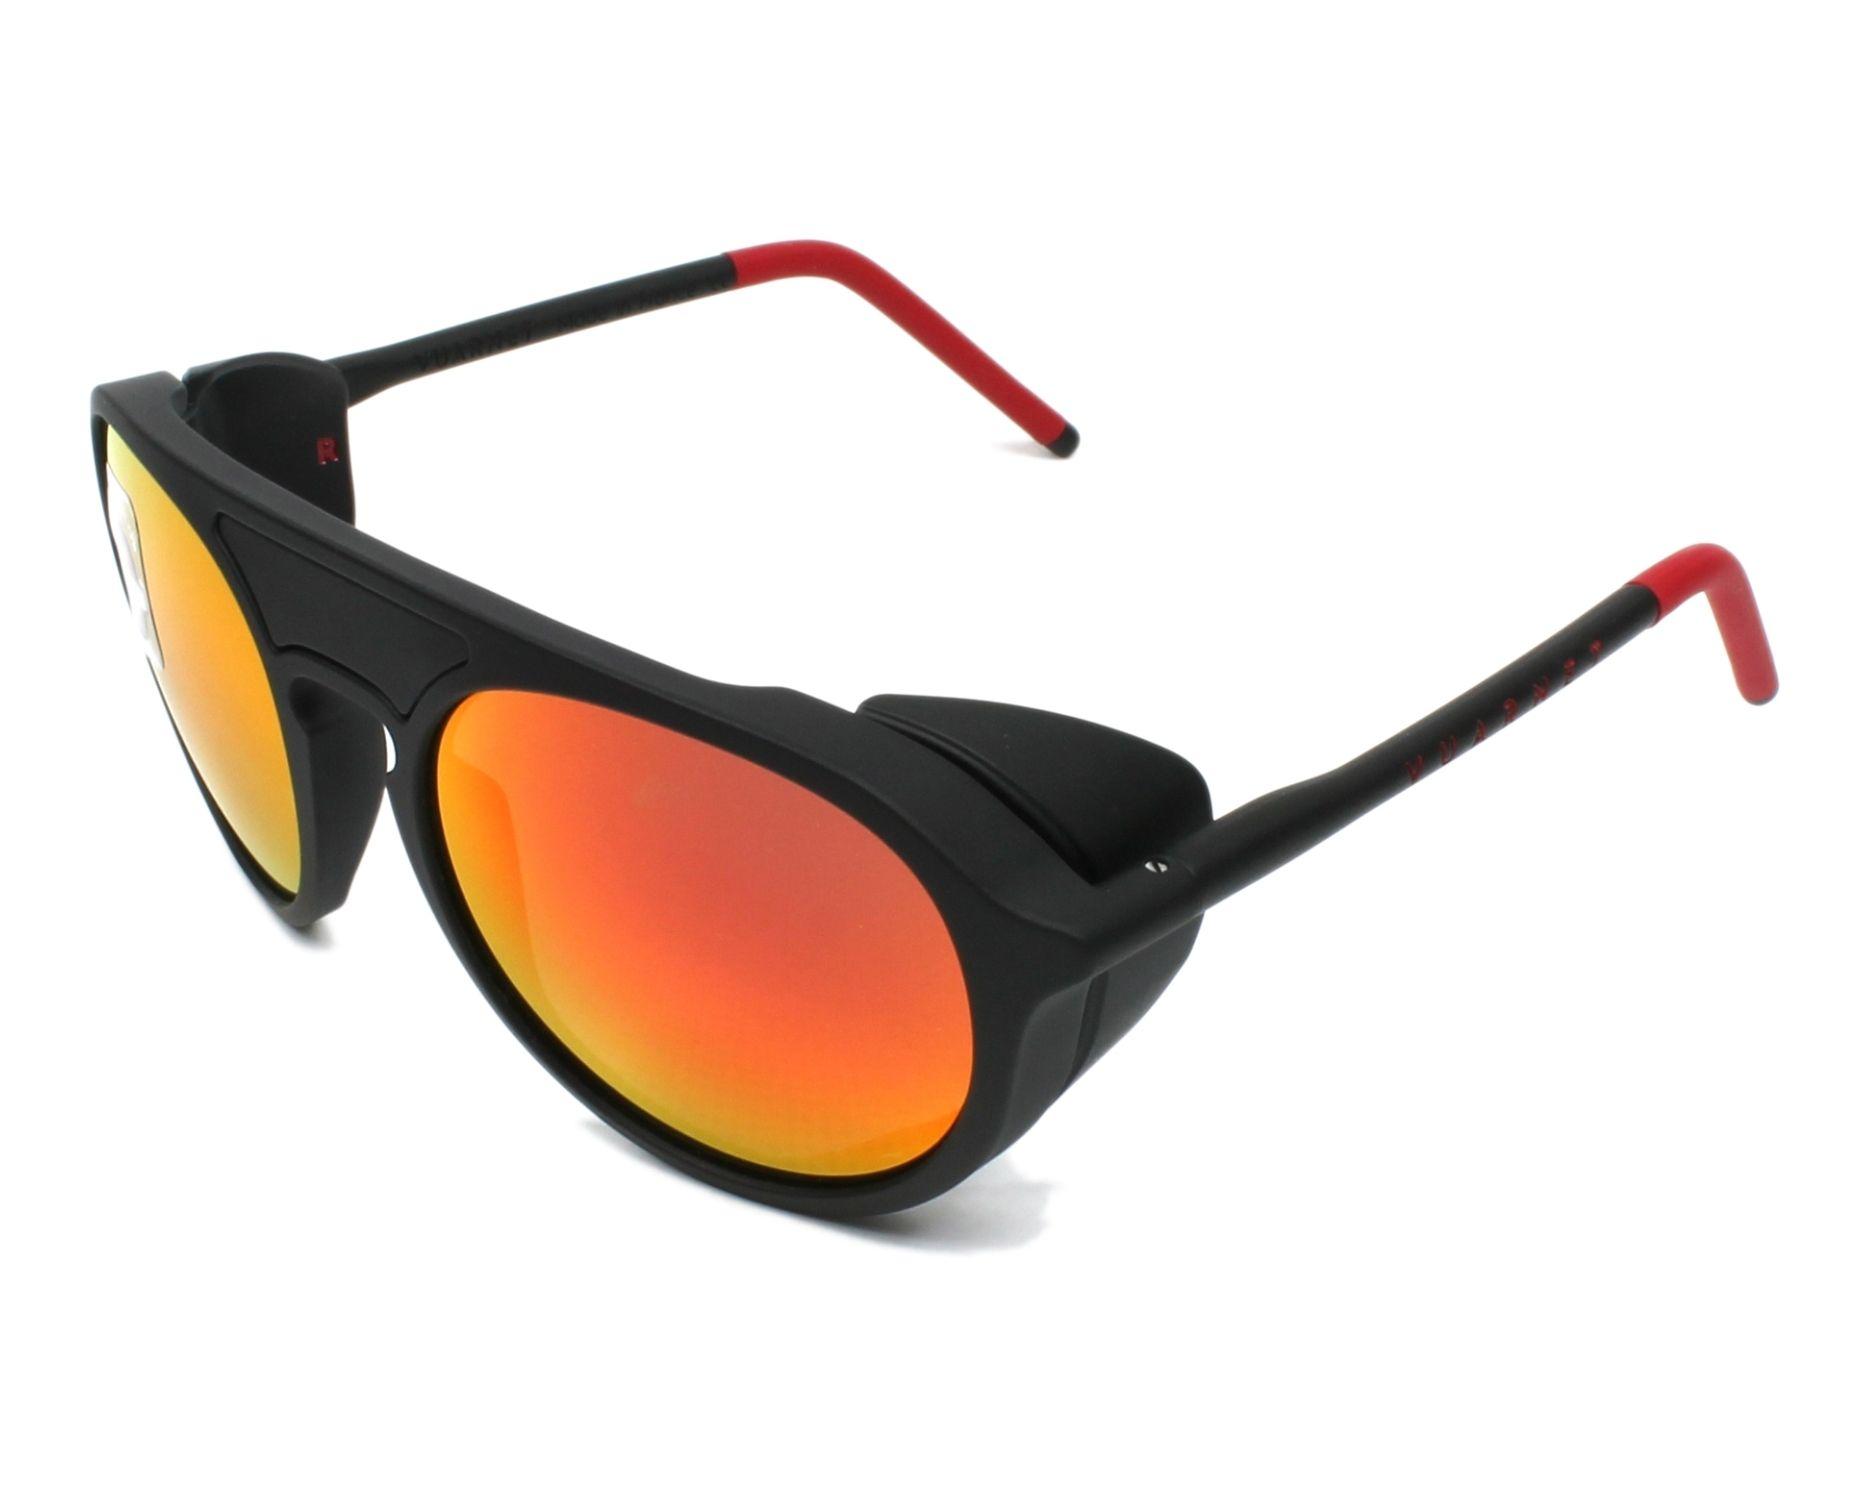 a81b6c305a Sunglasses Vuarnet VL-1709 0006-1130 51-18 Black Red profile view